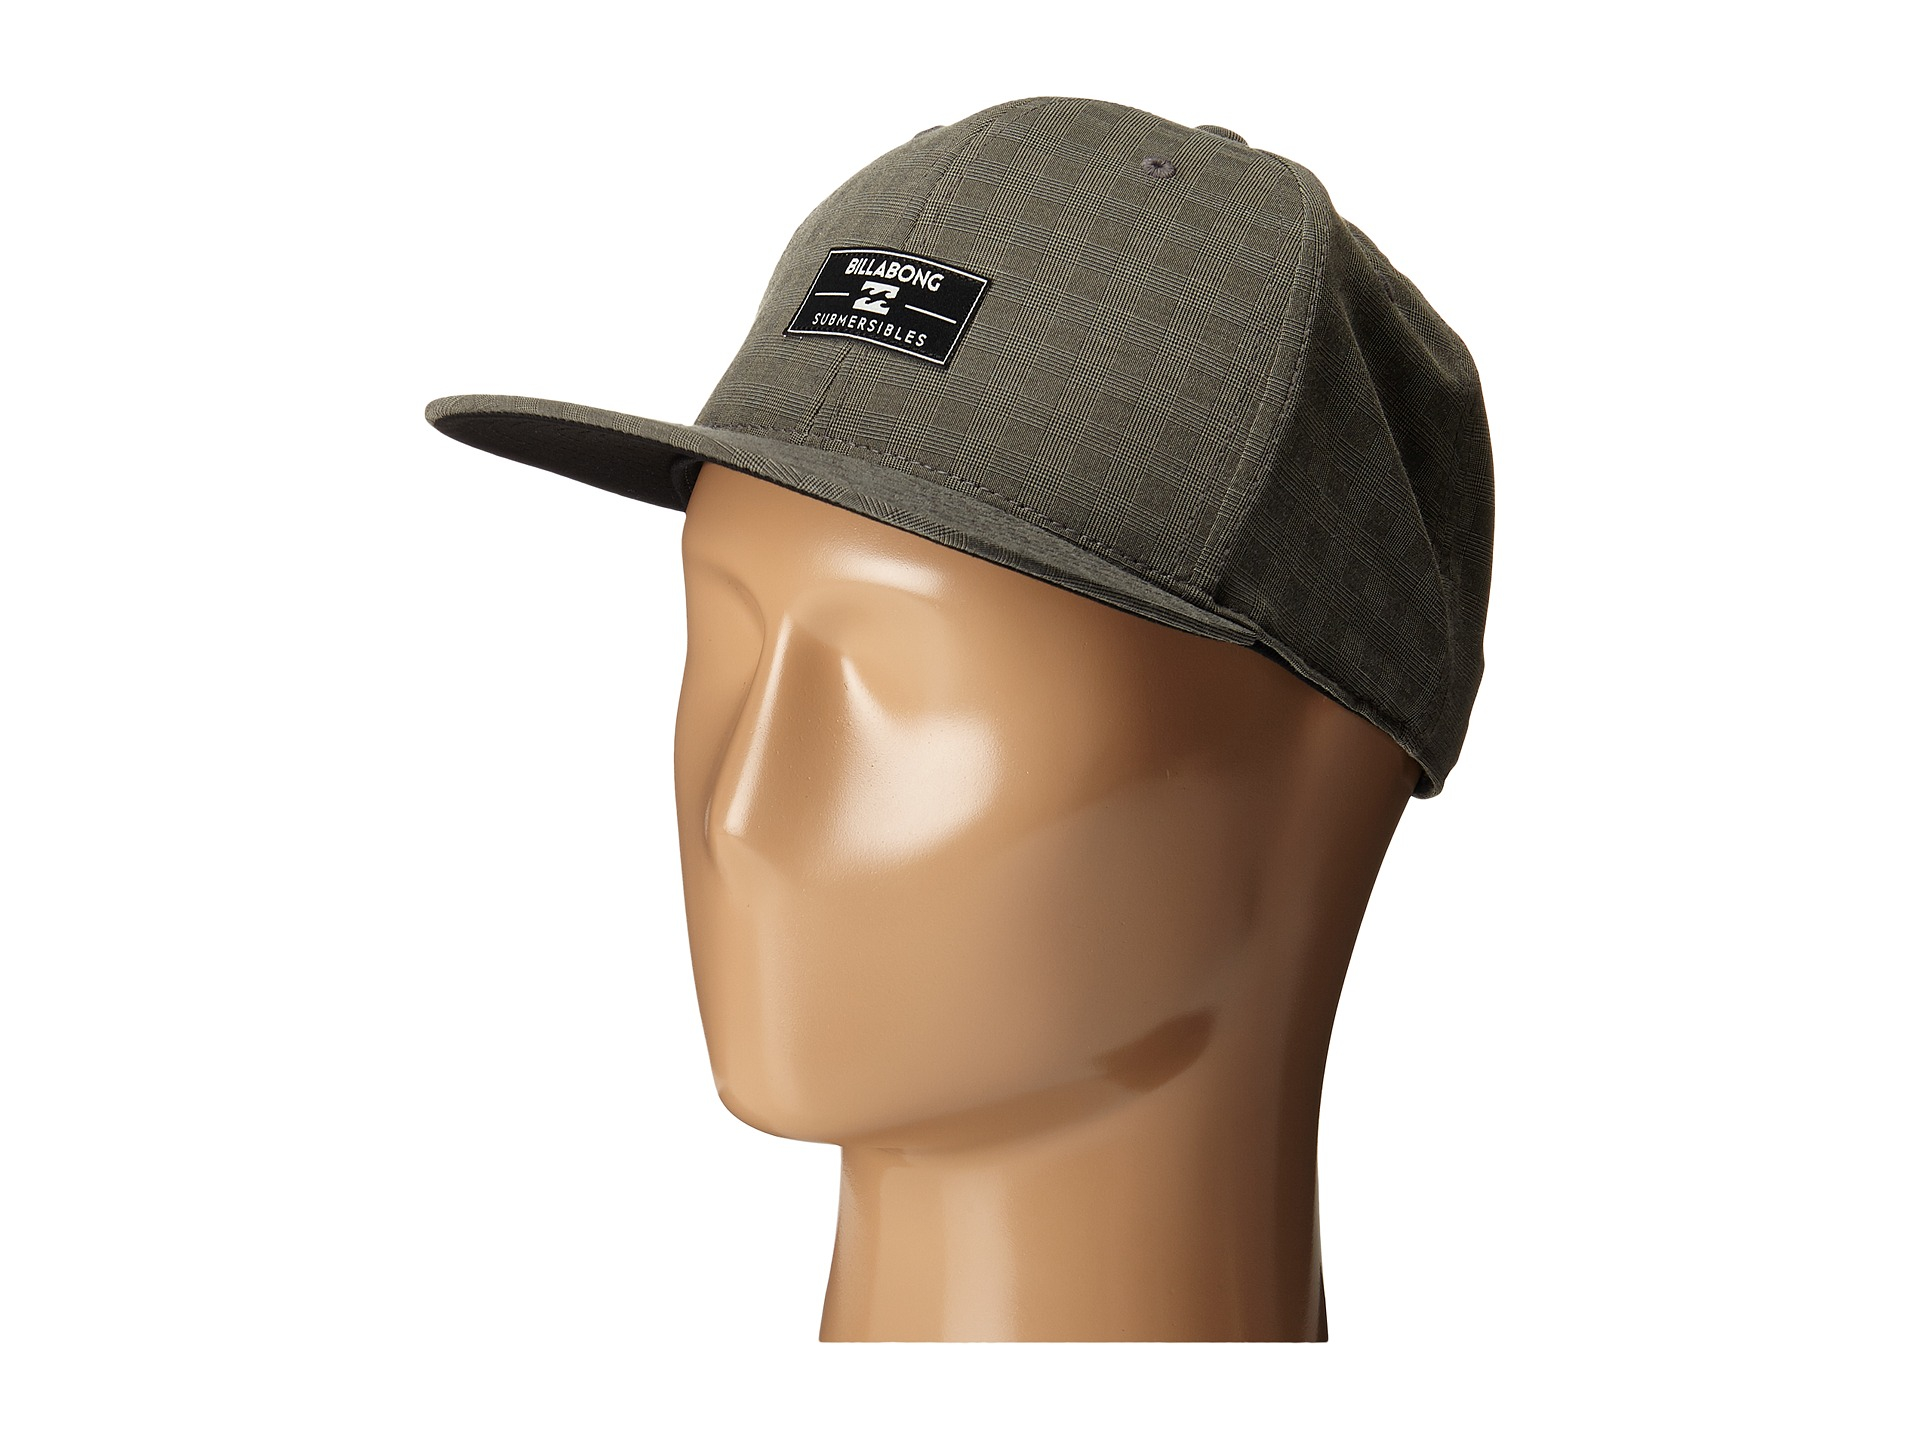 Lyst - Billabong Submersible 110 Flexfit Hat for Men 46595ff315b